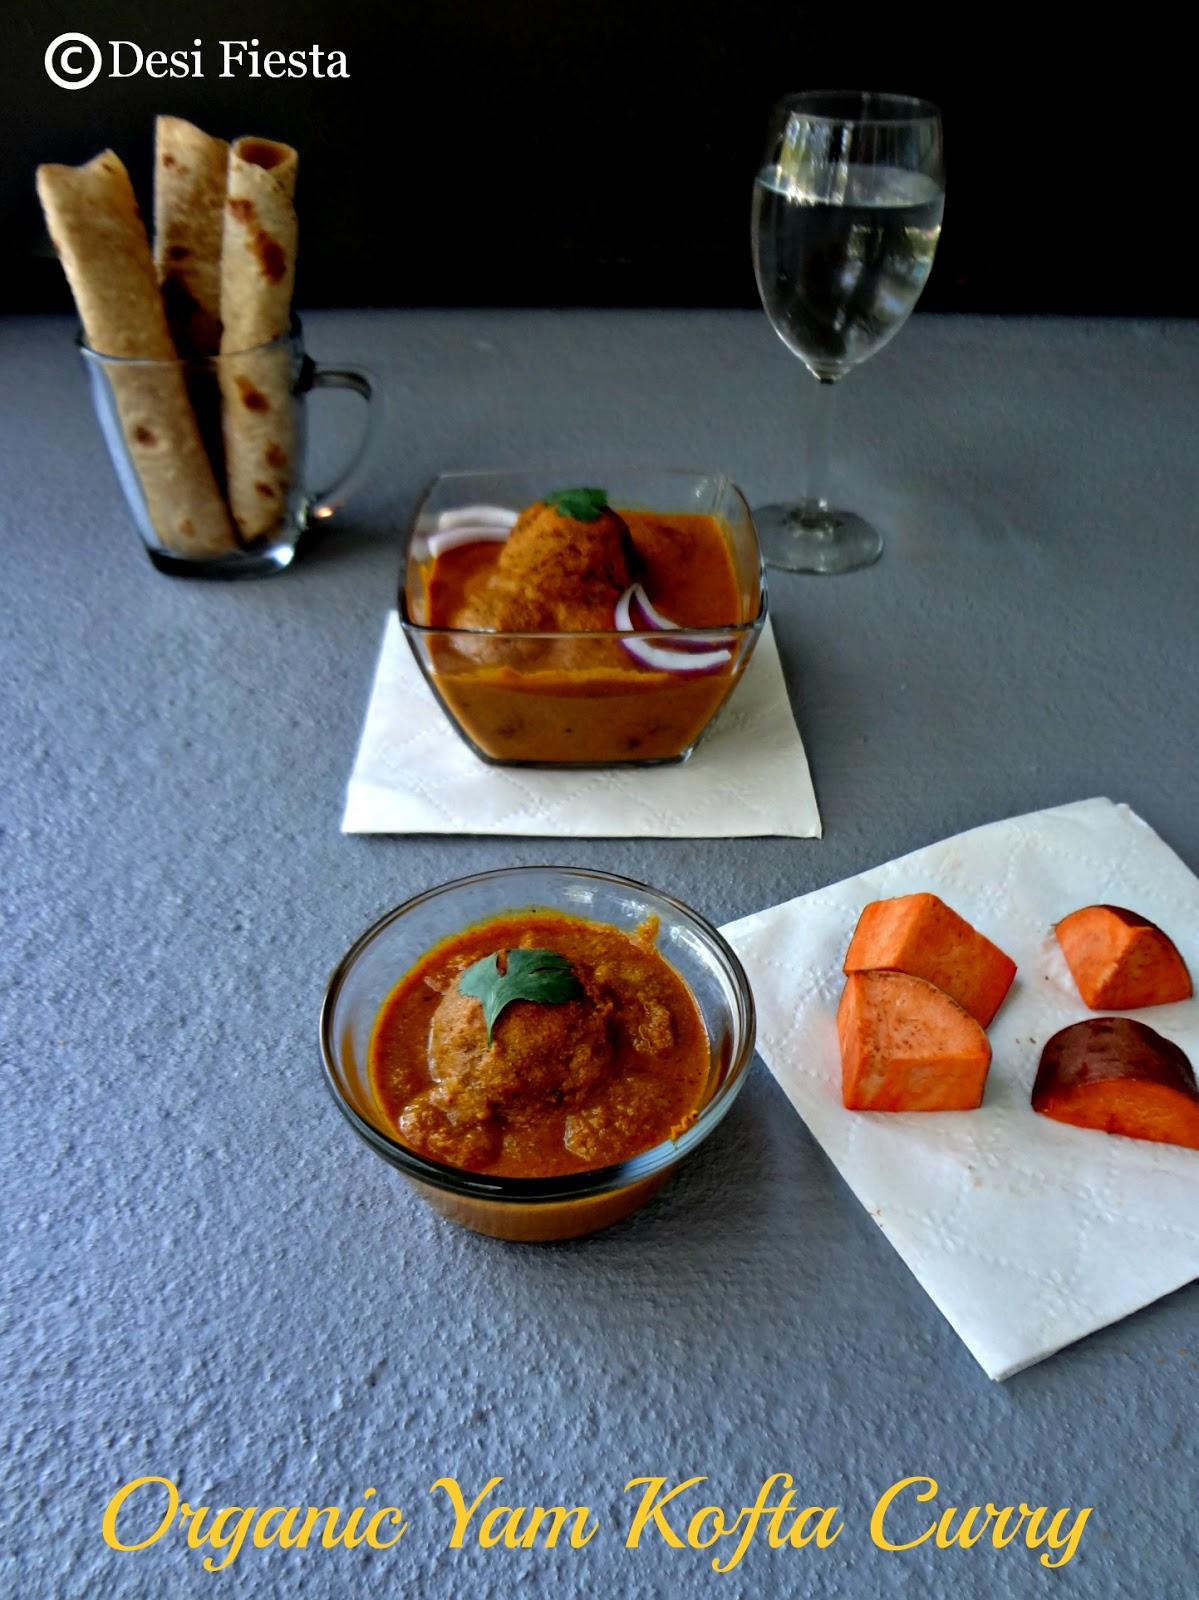 Desi Fiesta : Organic Yam Kofta curry